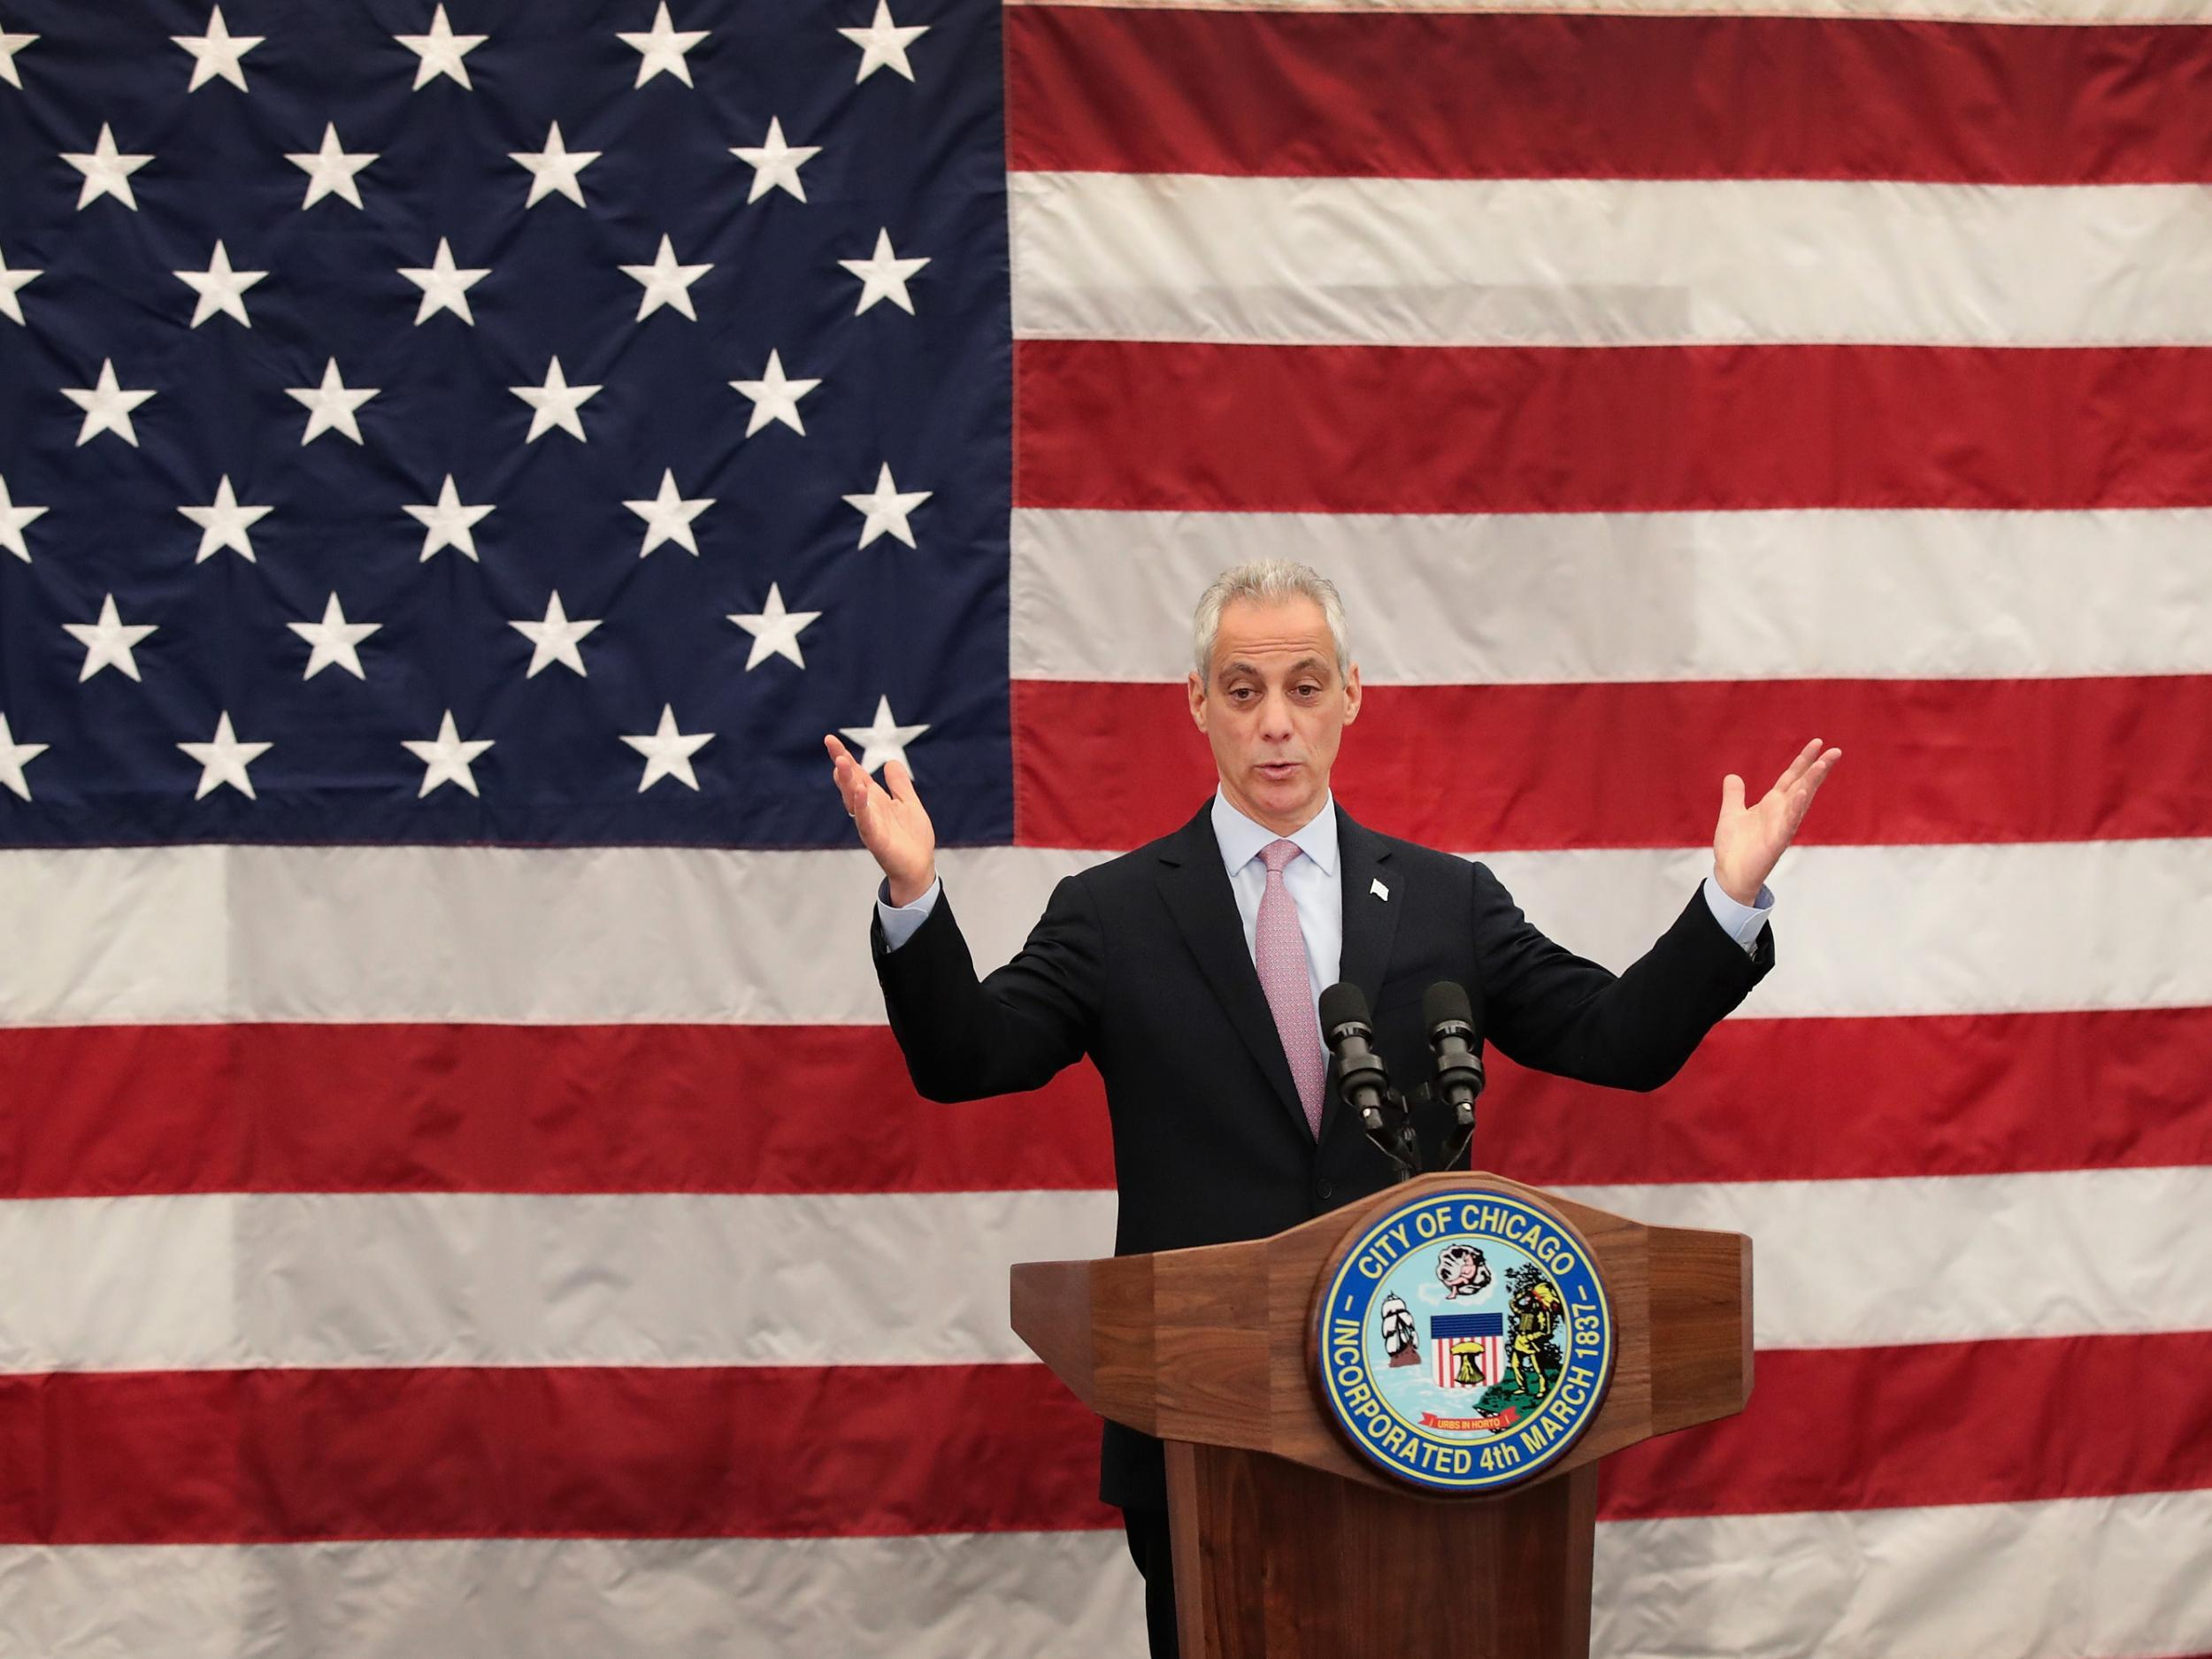 Chicago mayor declares city 'Trump-free zone' after US President declares he will scrap DACA immigration programme